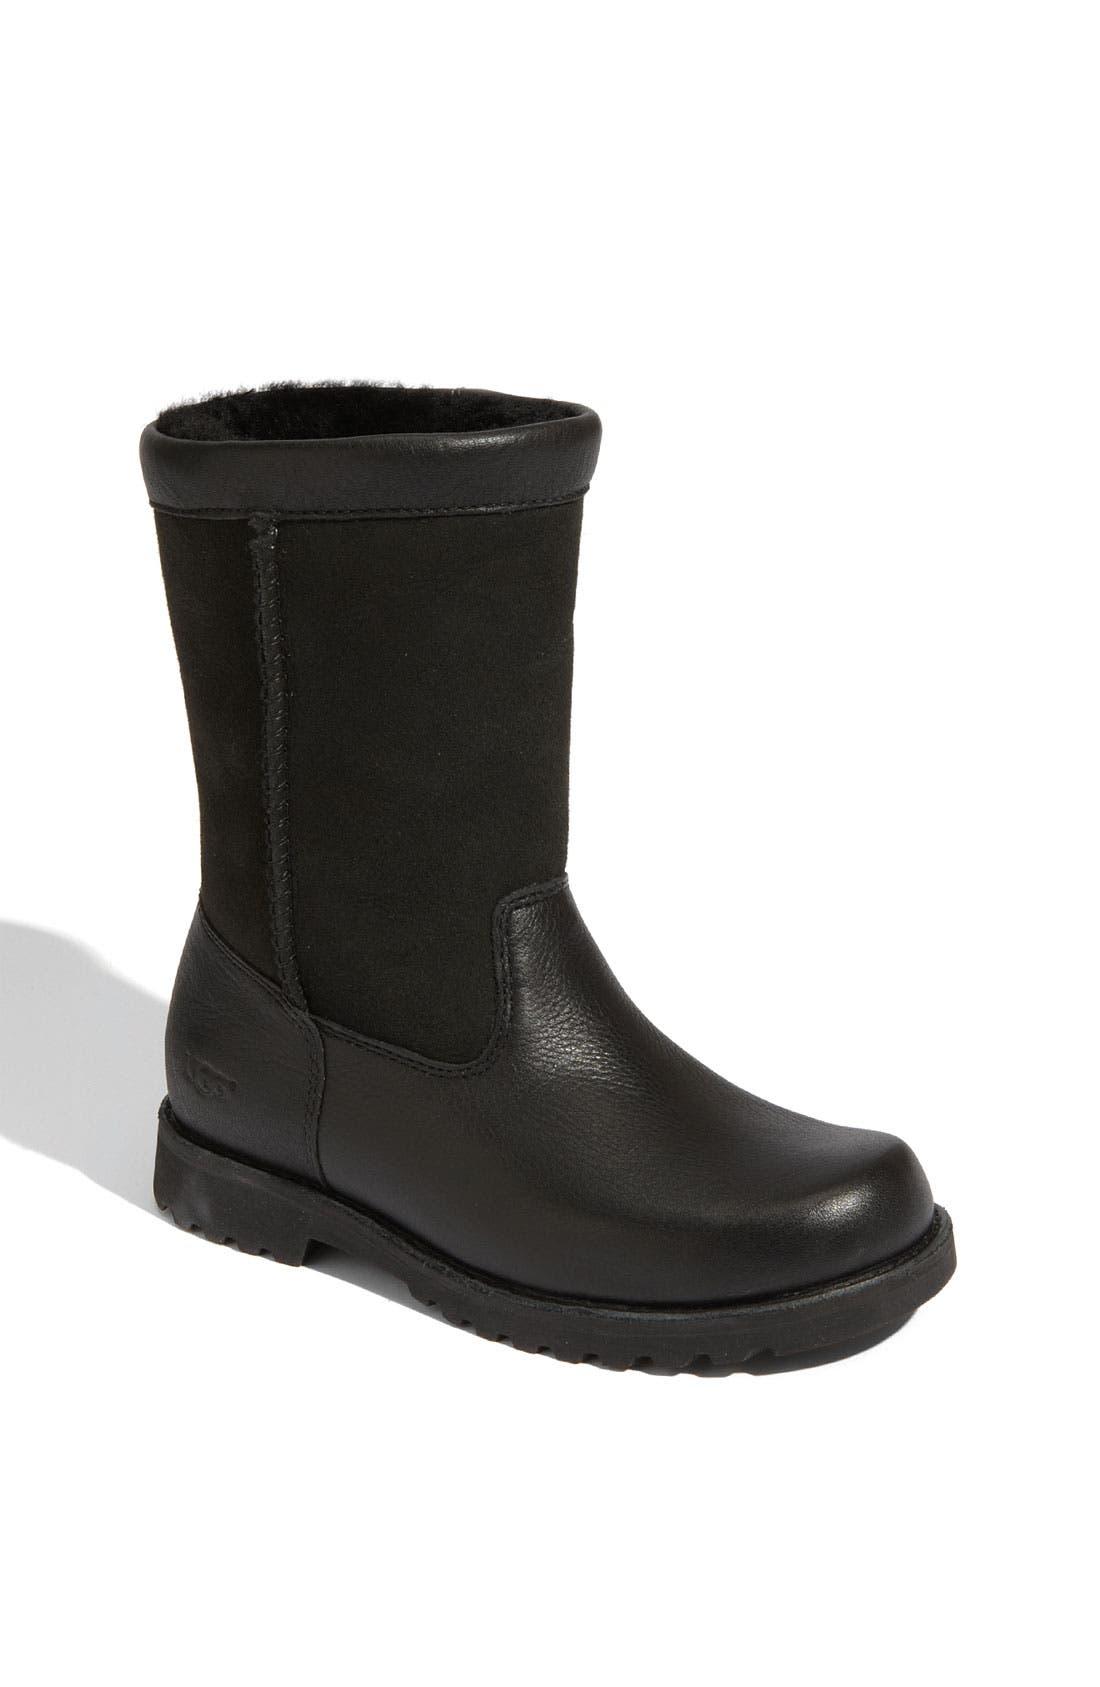 'Riverton' Boot,                             Main thumbnail 1, color,                             007